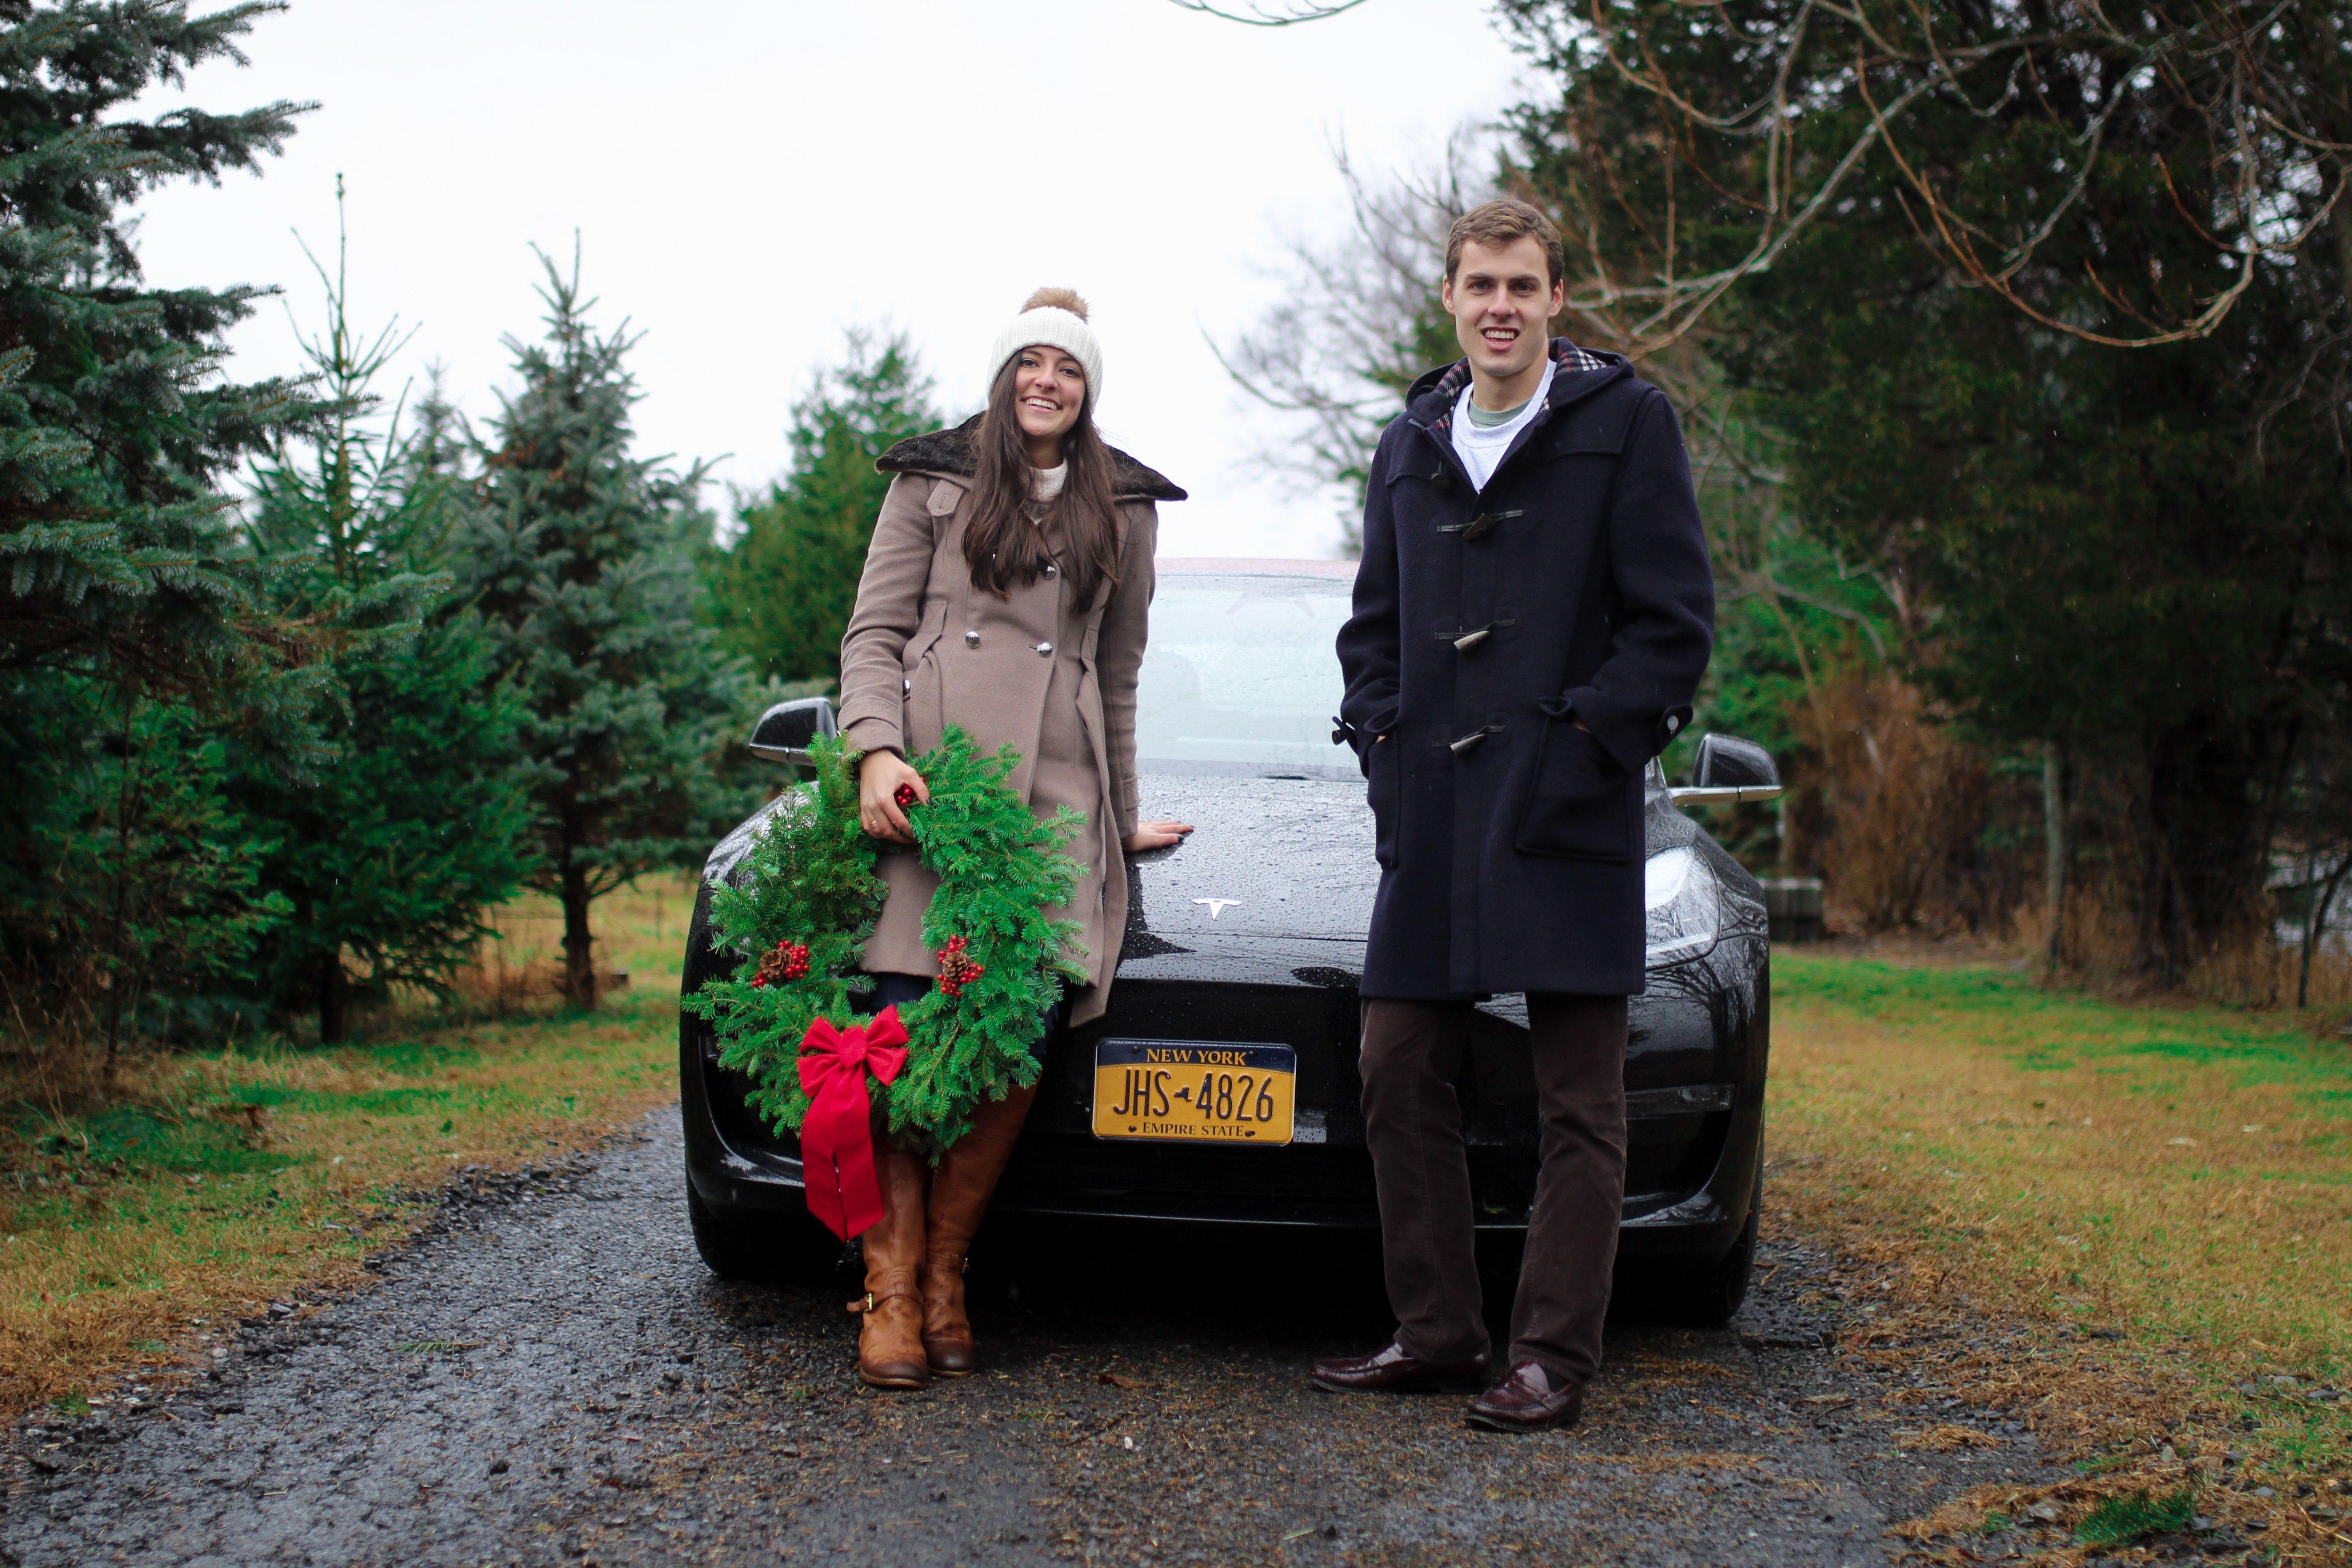 Fox Ridge Christmas Tree Farm - Take 6 #christmastreefarm #christmastree #visitnewyork #visitnyc #christmastime #nyctravel #winterwonderland #winterlove #christmasinnyc #nyclifestyle #nycbloggers #newyorkcouple #upperwestside #nycchristmas #holidayseason #tistheseason #nycbloggers #upperwestsiders #nyclove #freedomthinkers #countryroads #christmaslove #tesla #teslamotors